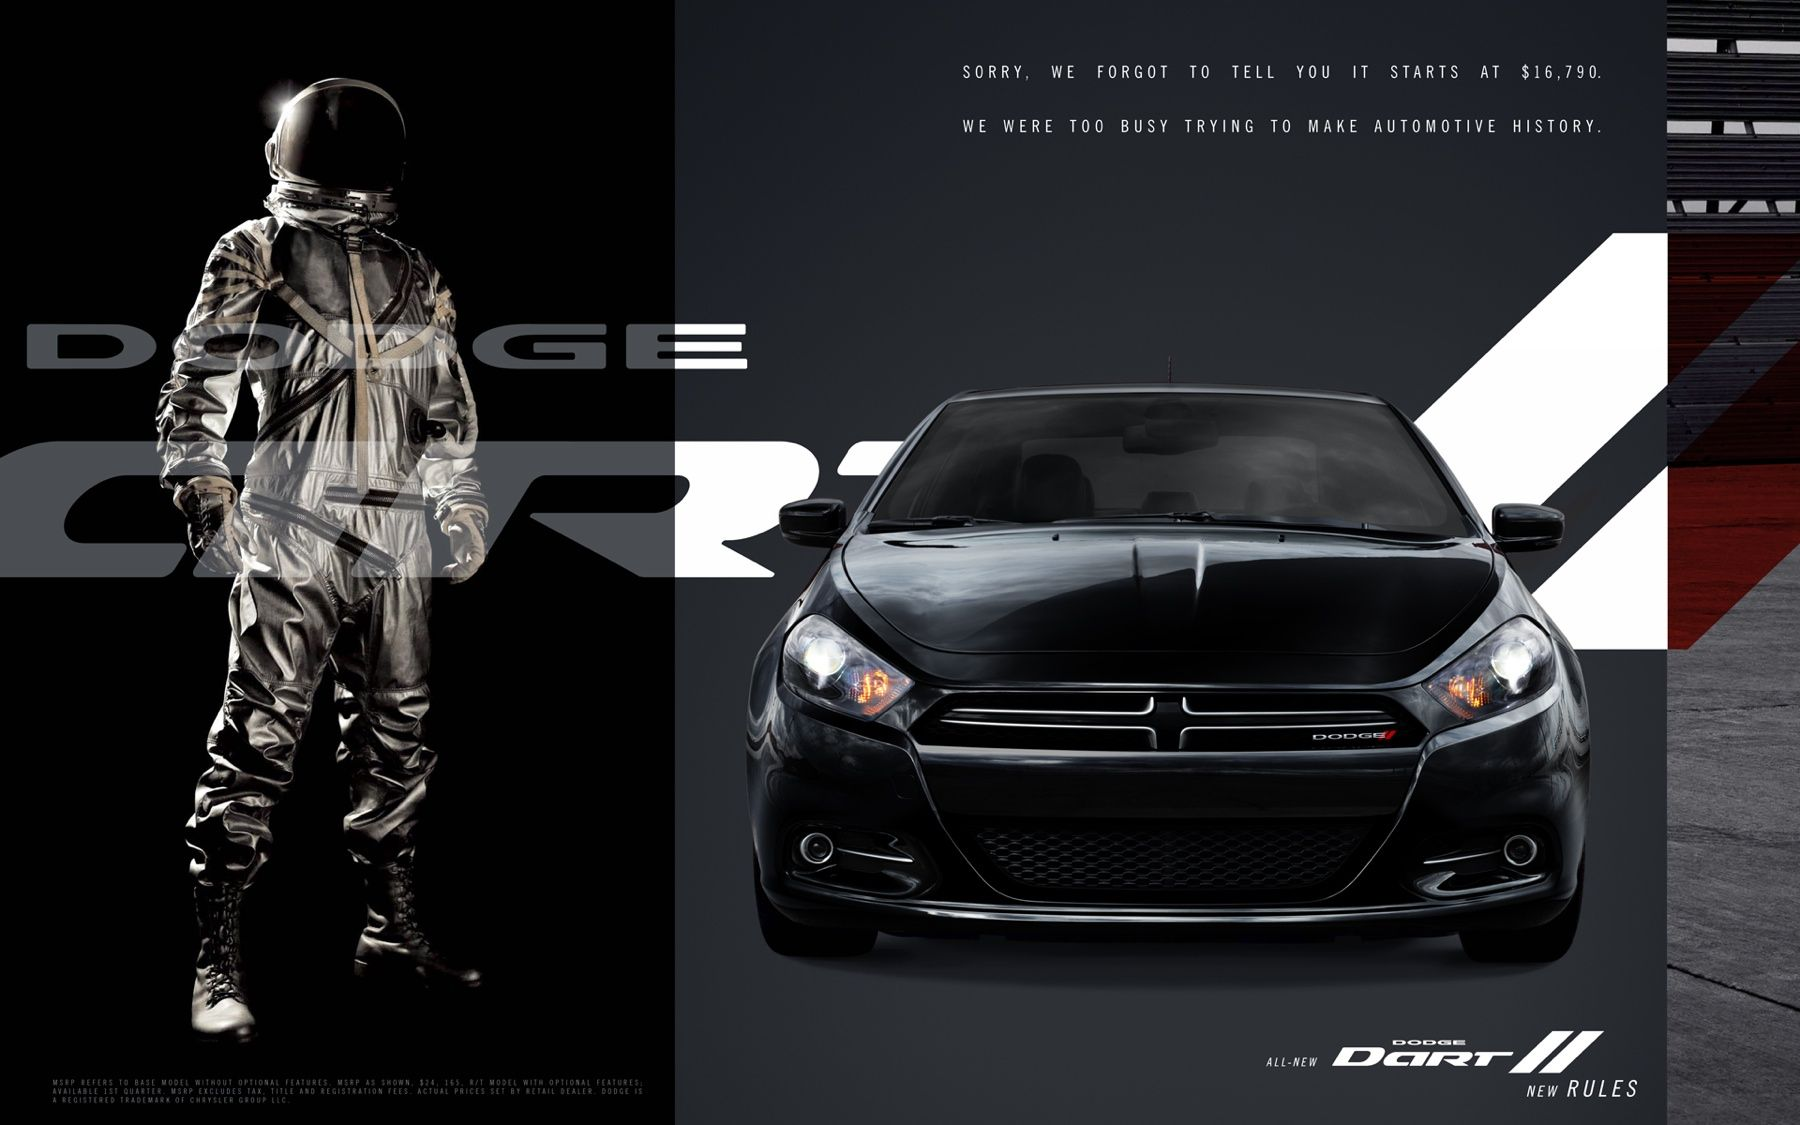 Dodge Dart Black design graphic Pinterest